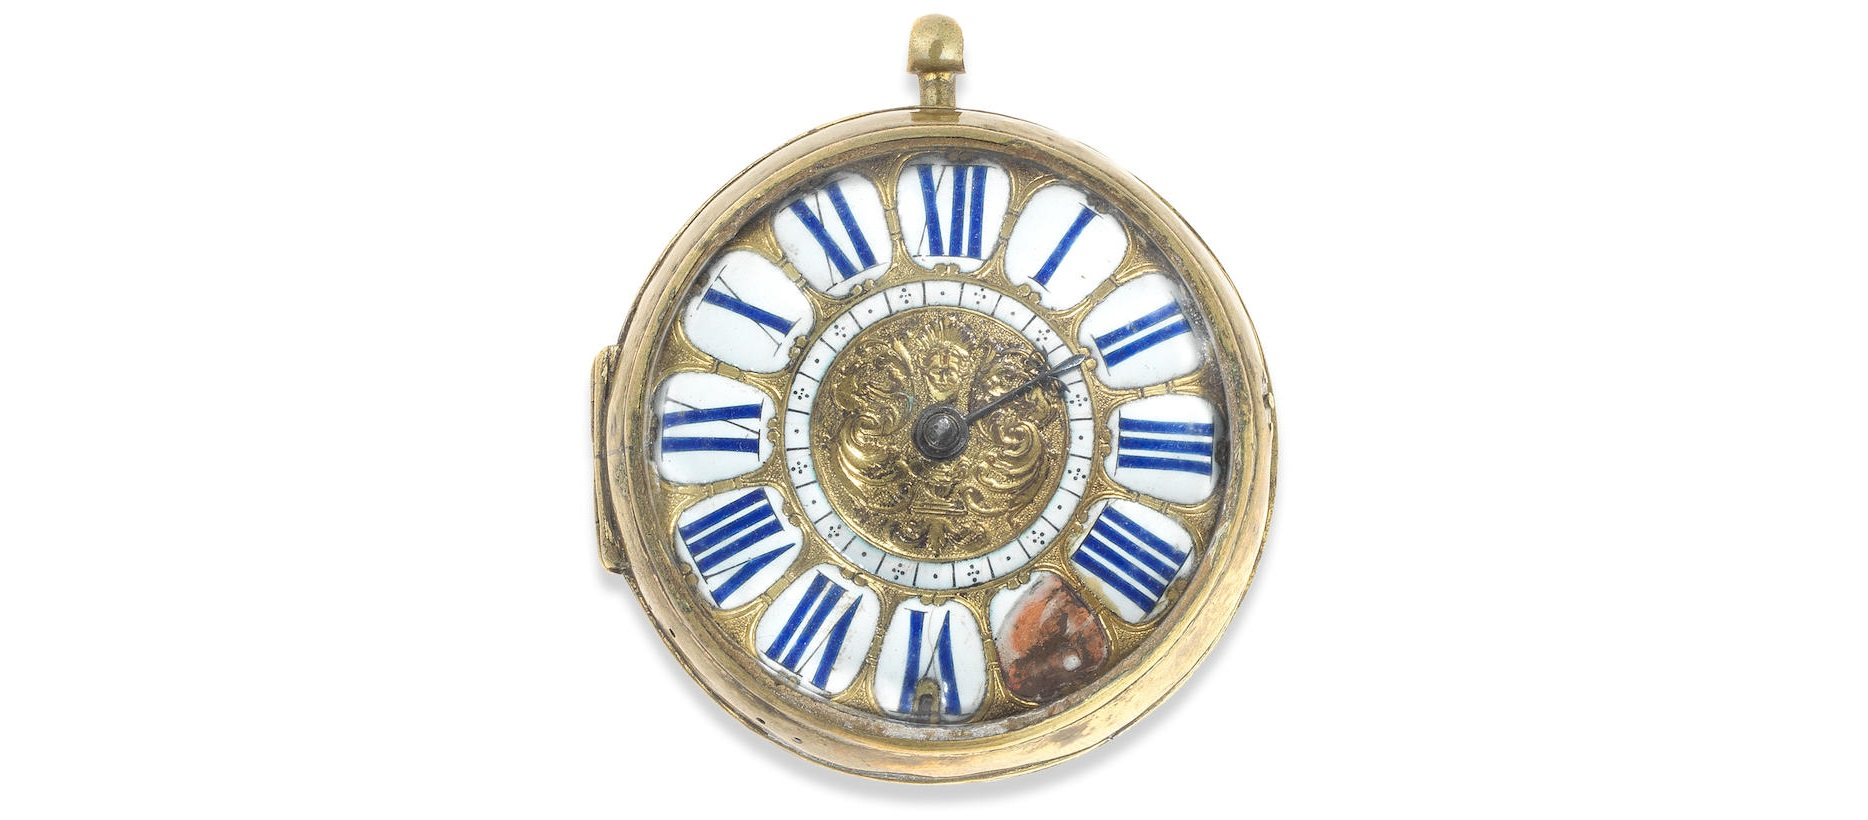 Lot 4 - A large key wind open face oignon pocket watch